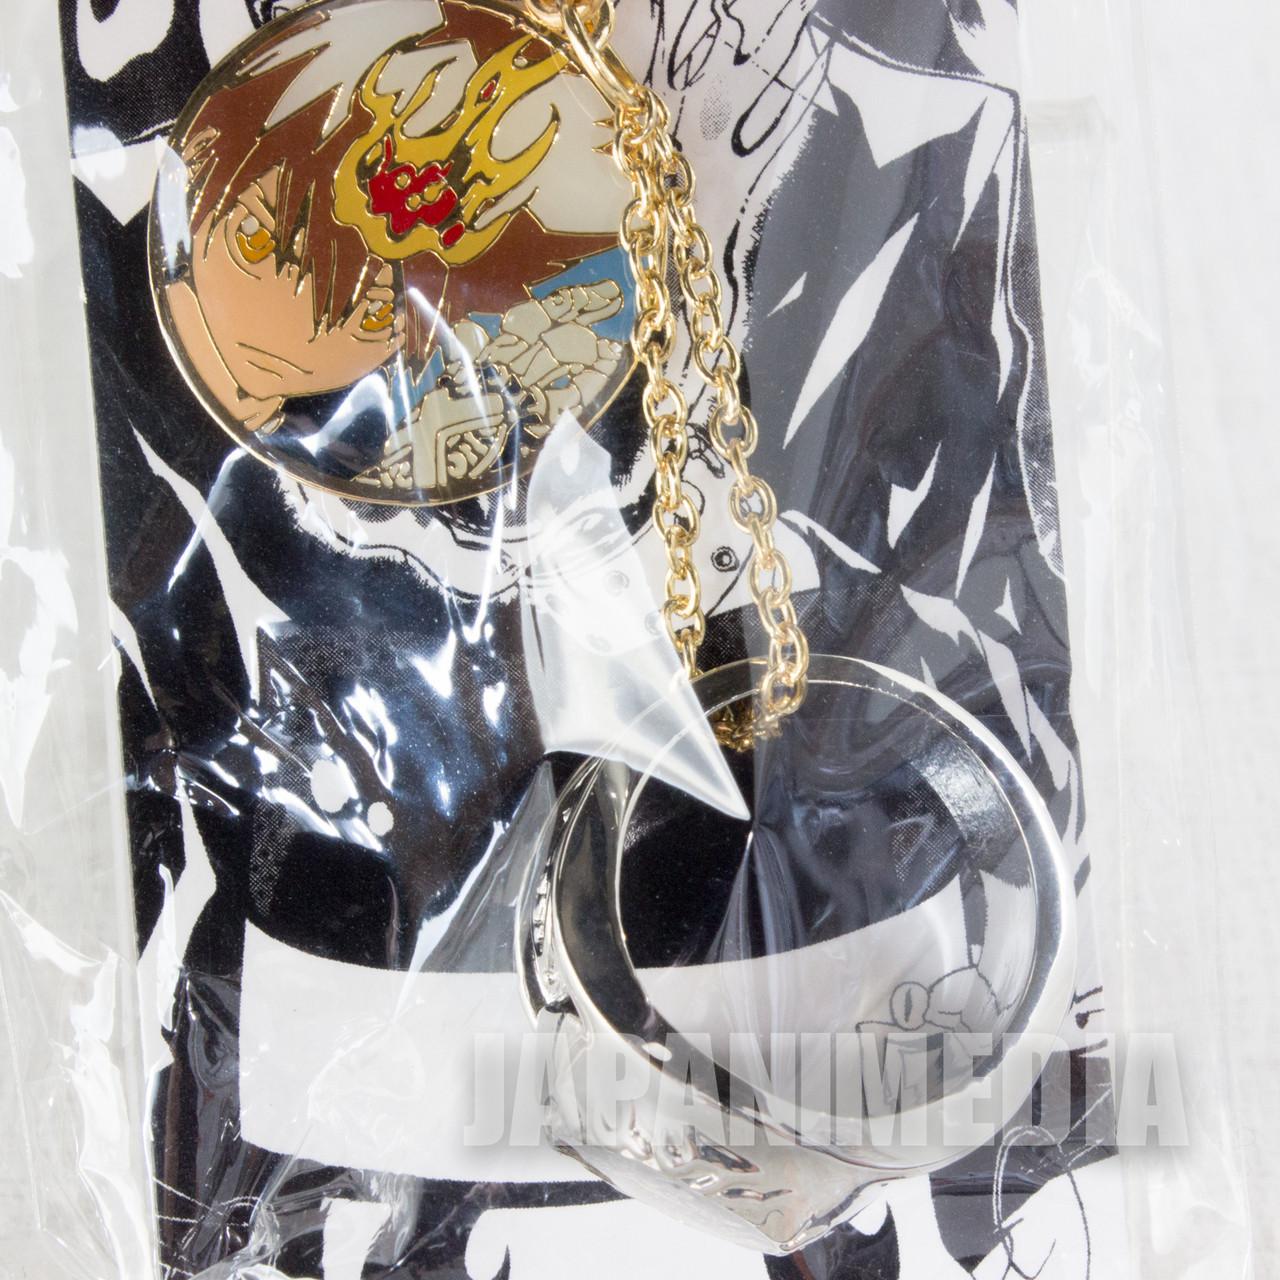 Katekyo Hitman Reborn Tsuna Sawada Vongola Ring Key Chain Japan Anime Manga Shonen Jump Japanimedia Store